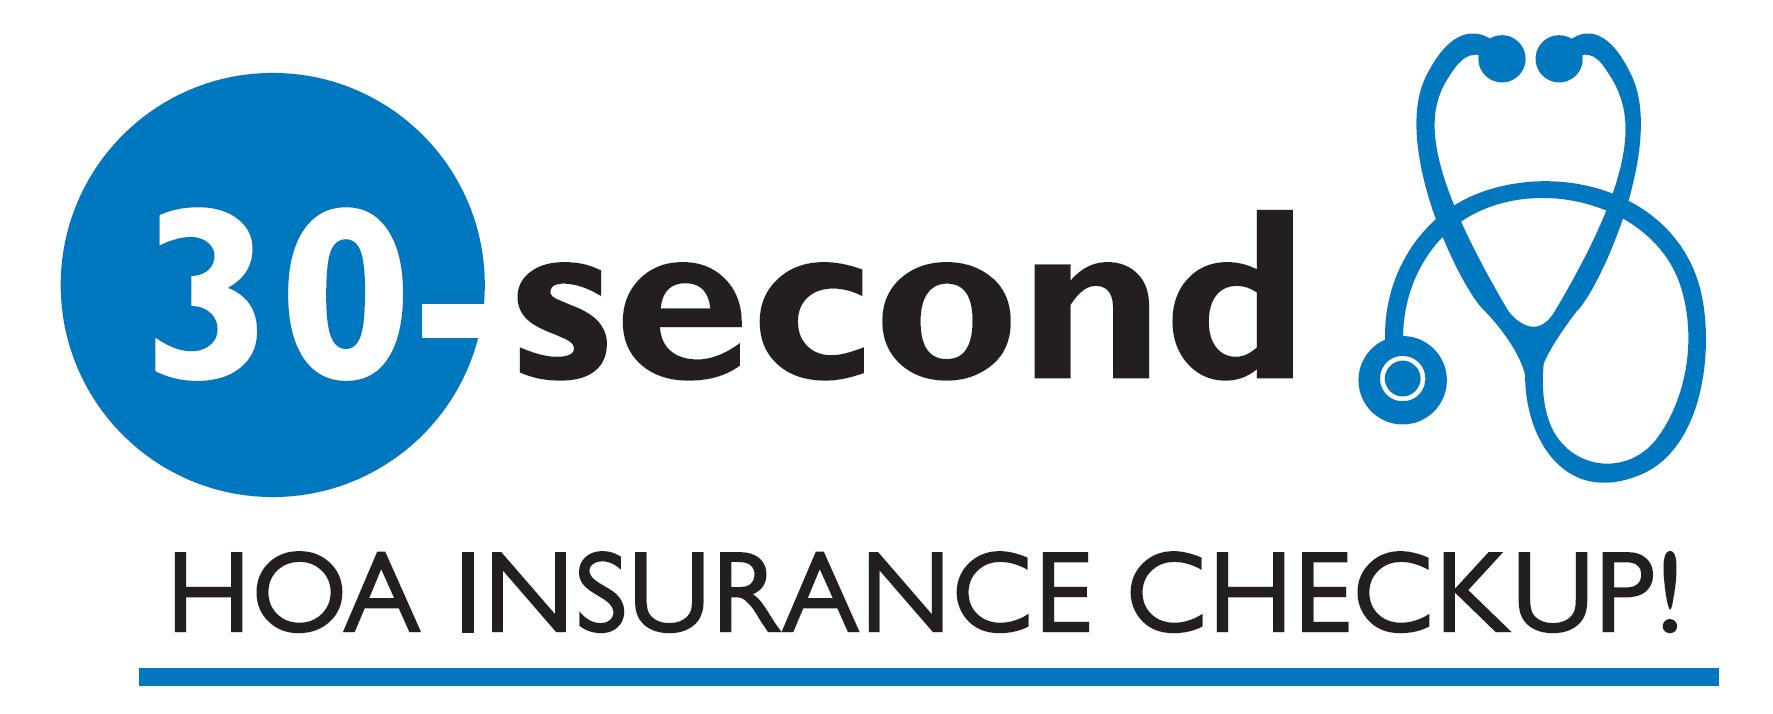 hoa-insurance-checkup-checklist